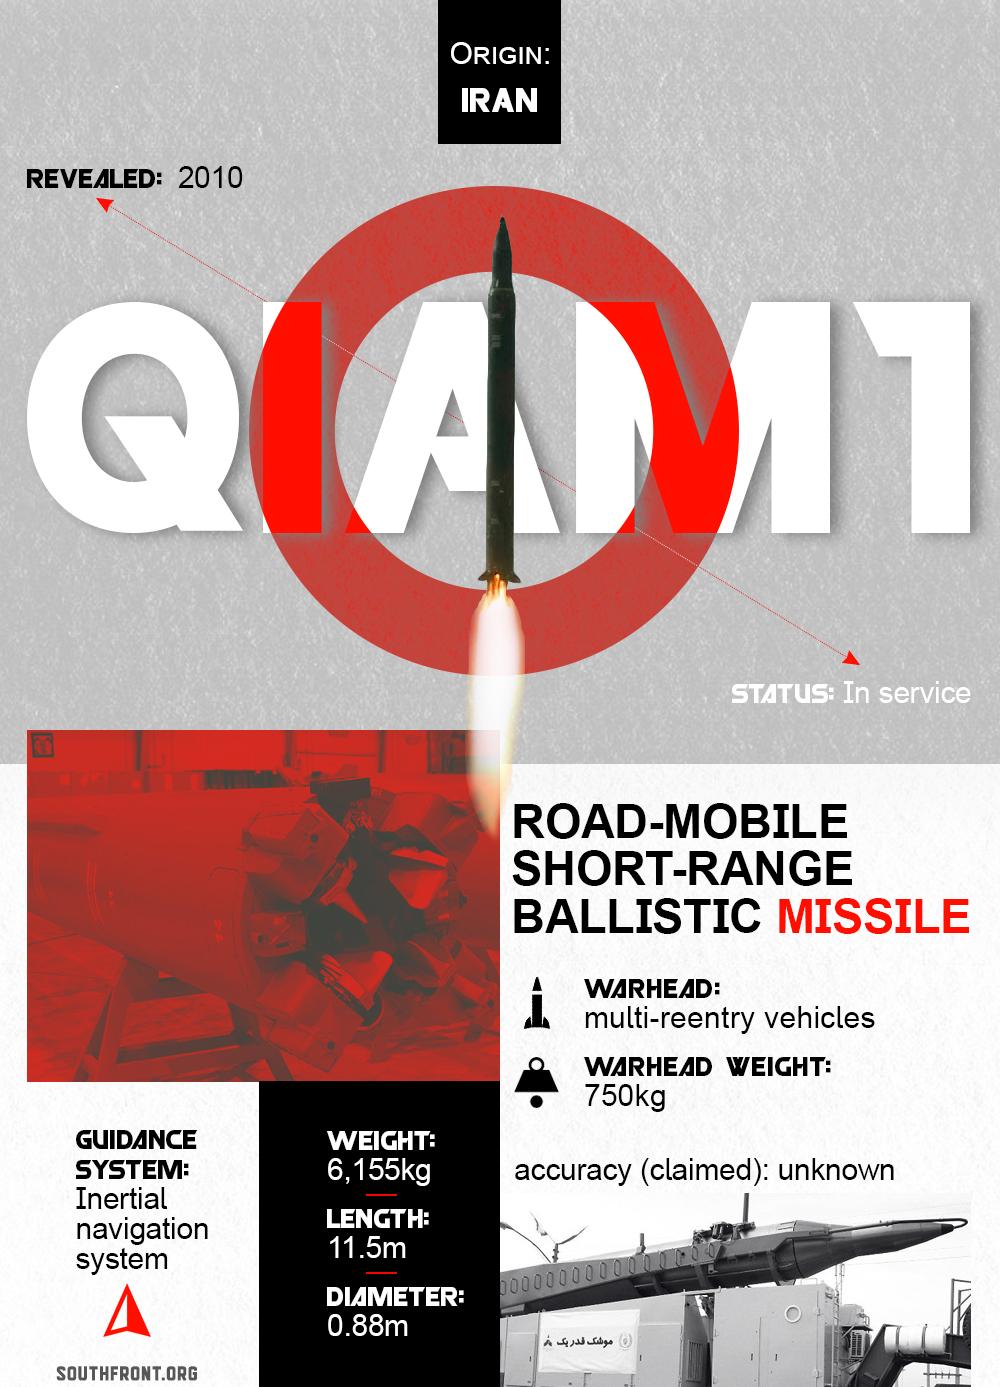 Iran's Qiam-1 Road-Mobile Short-Range Ballistic Missile (Infographics)